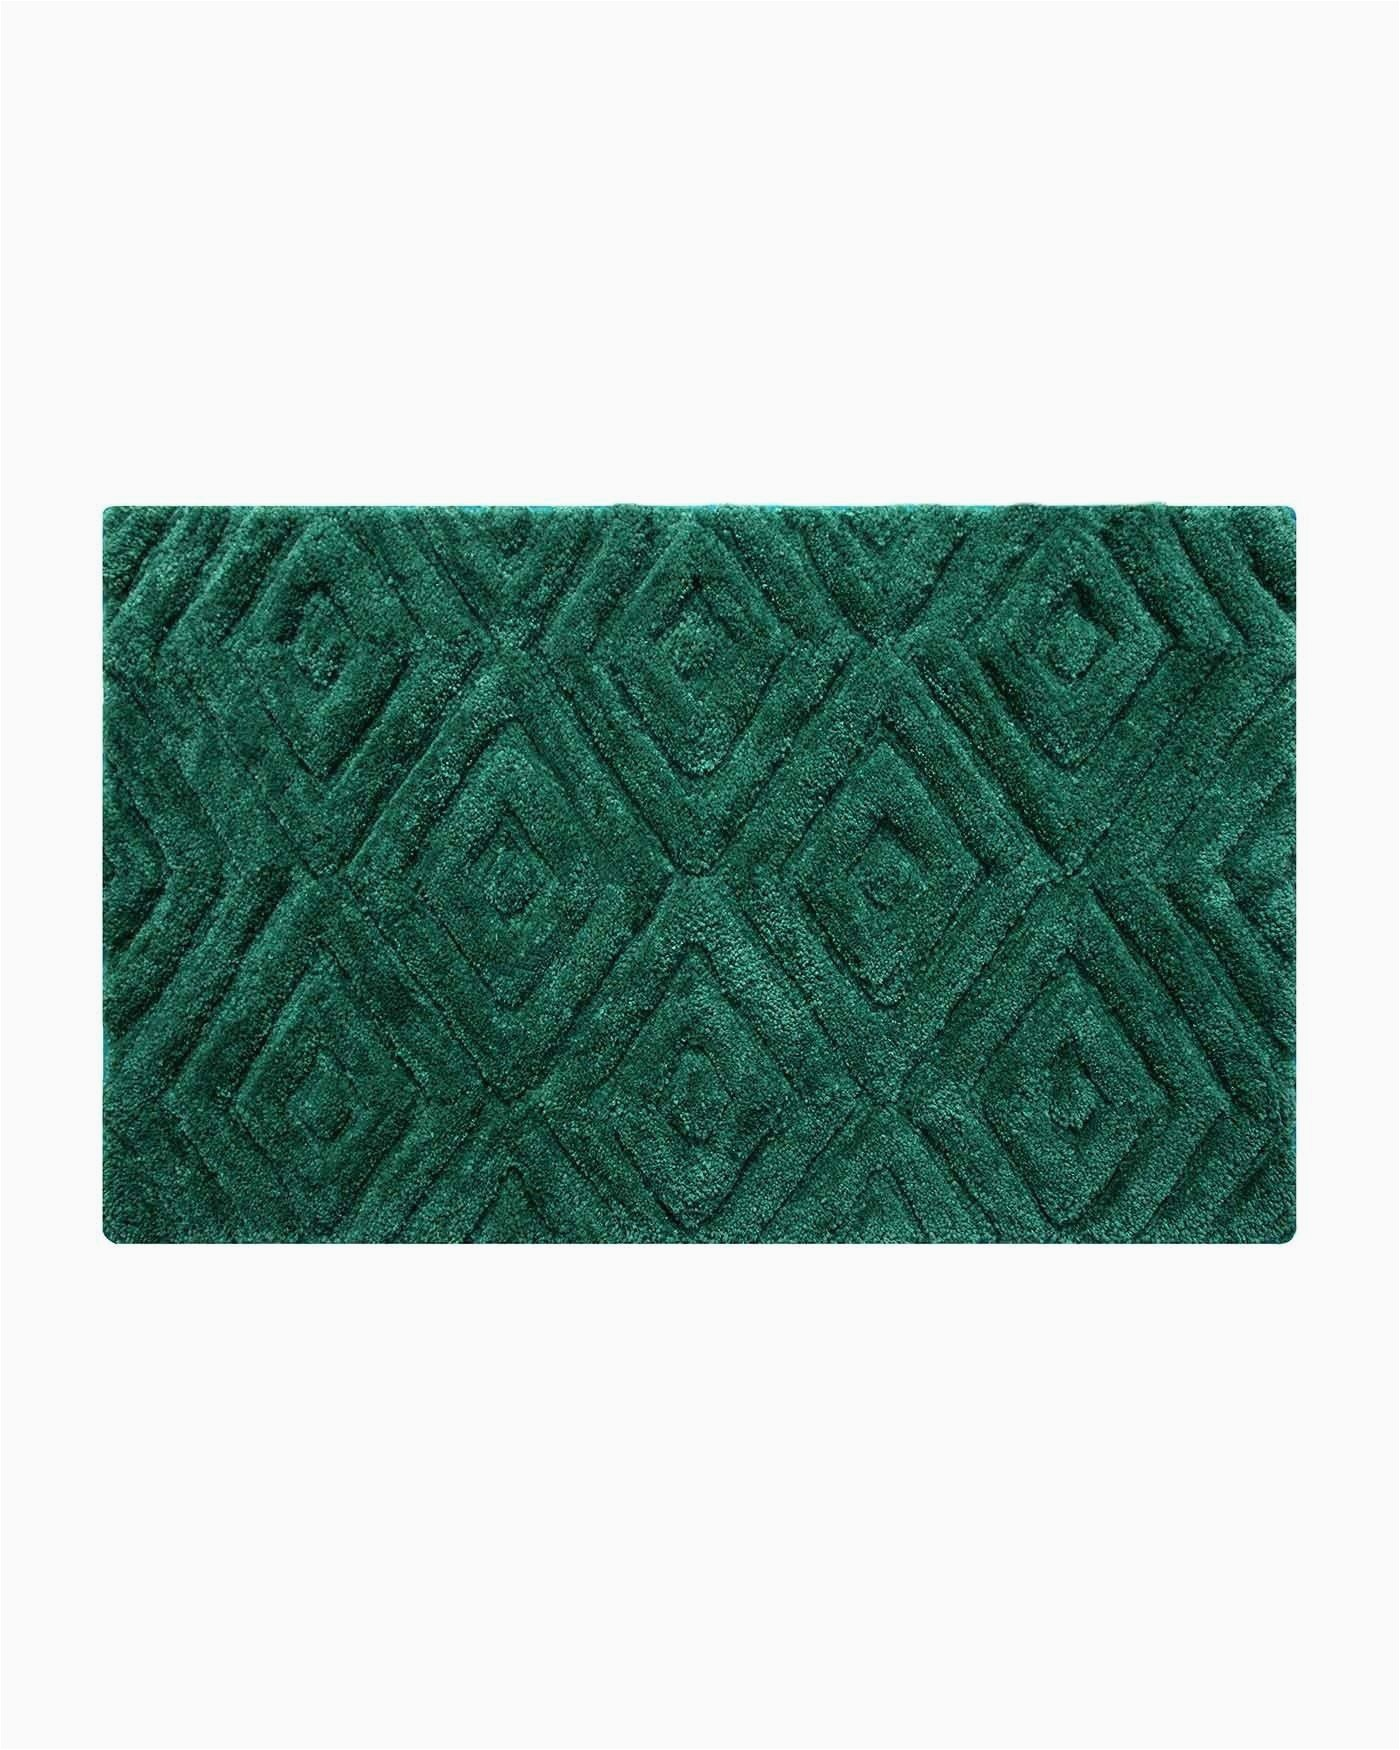 Emerald Green Bathroom Rug Set Thick Pile Emerald Green Bathmat This Large Bathroom Floor